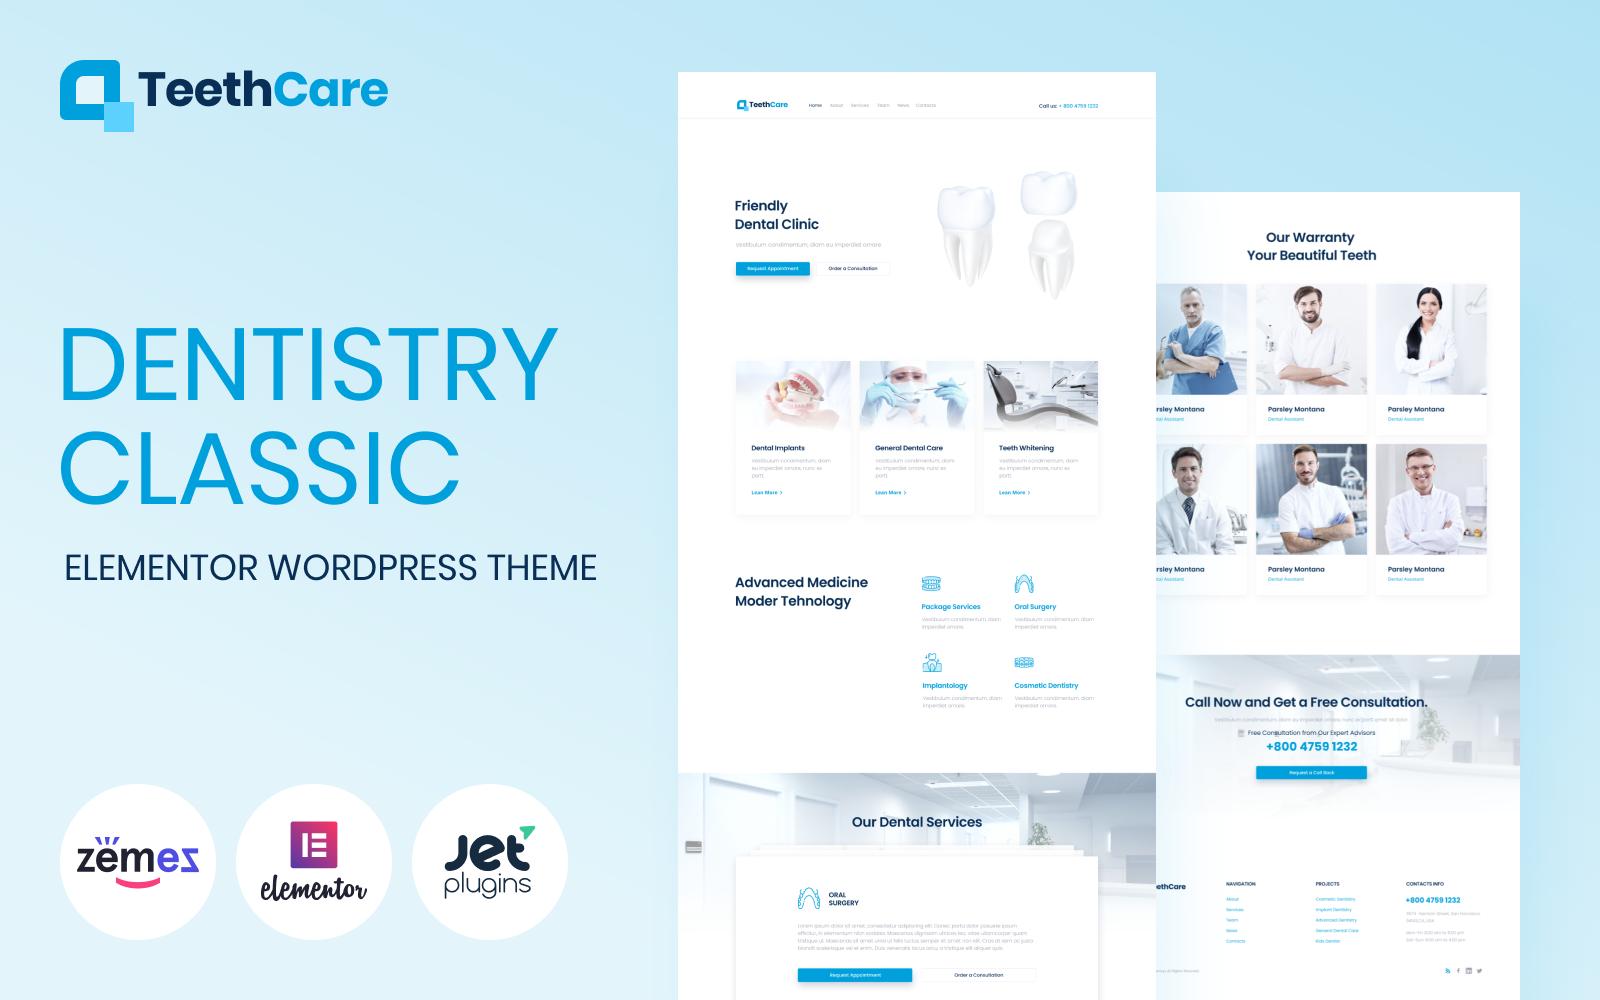 TeethCare - Dentistry Classic Elementor WordPress Theme